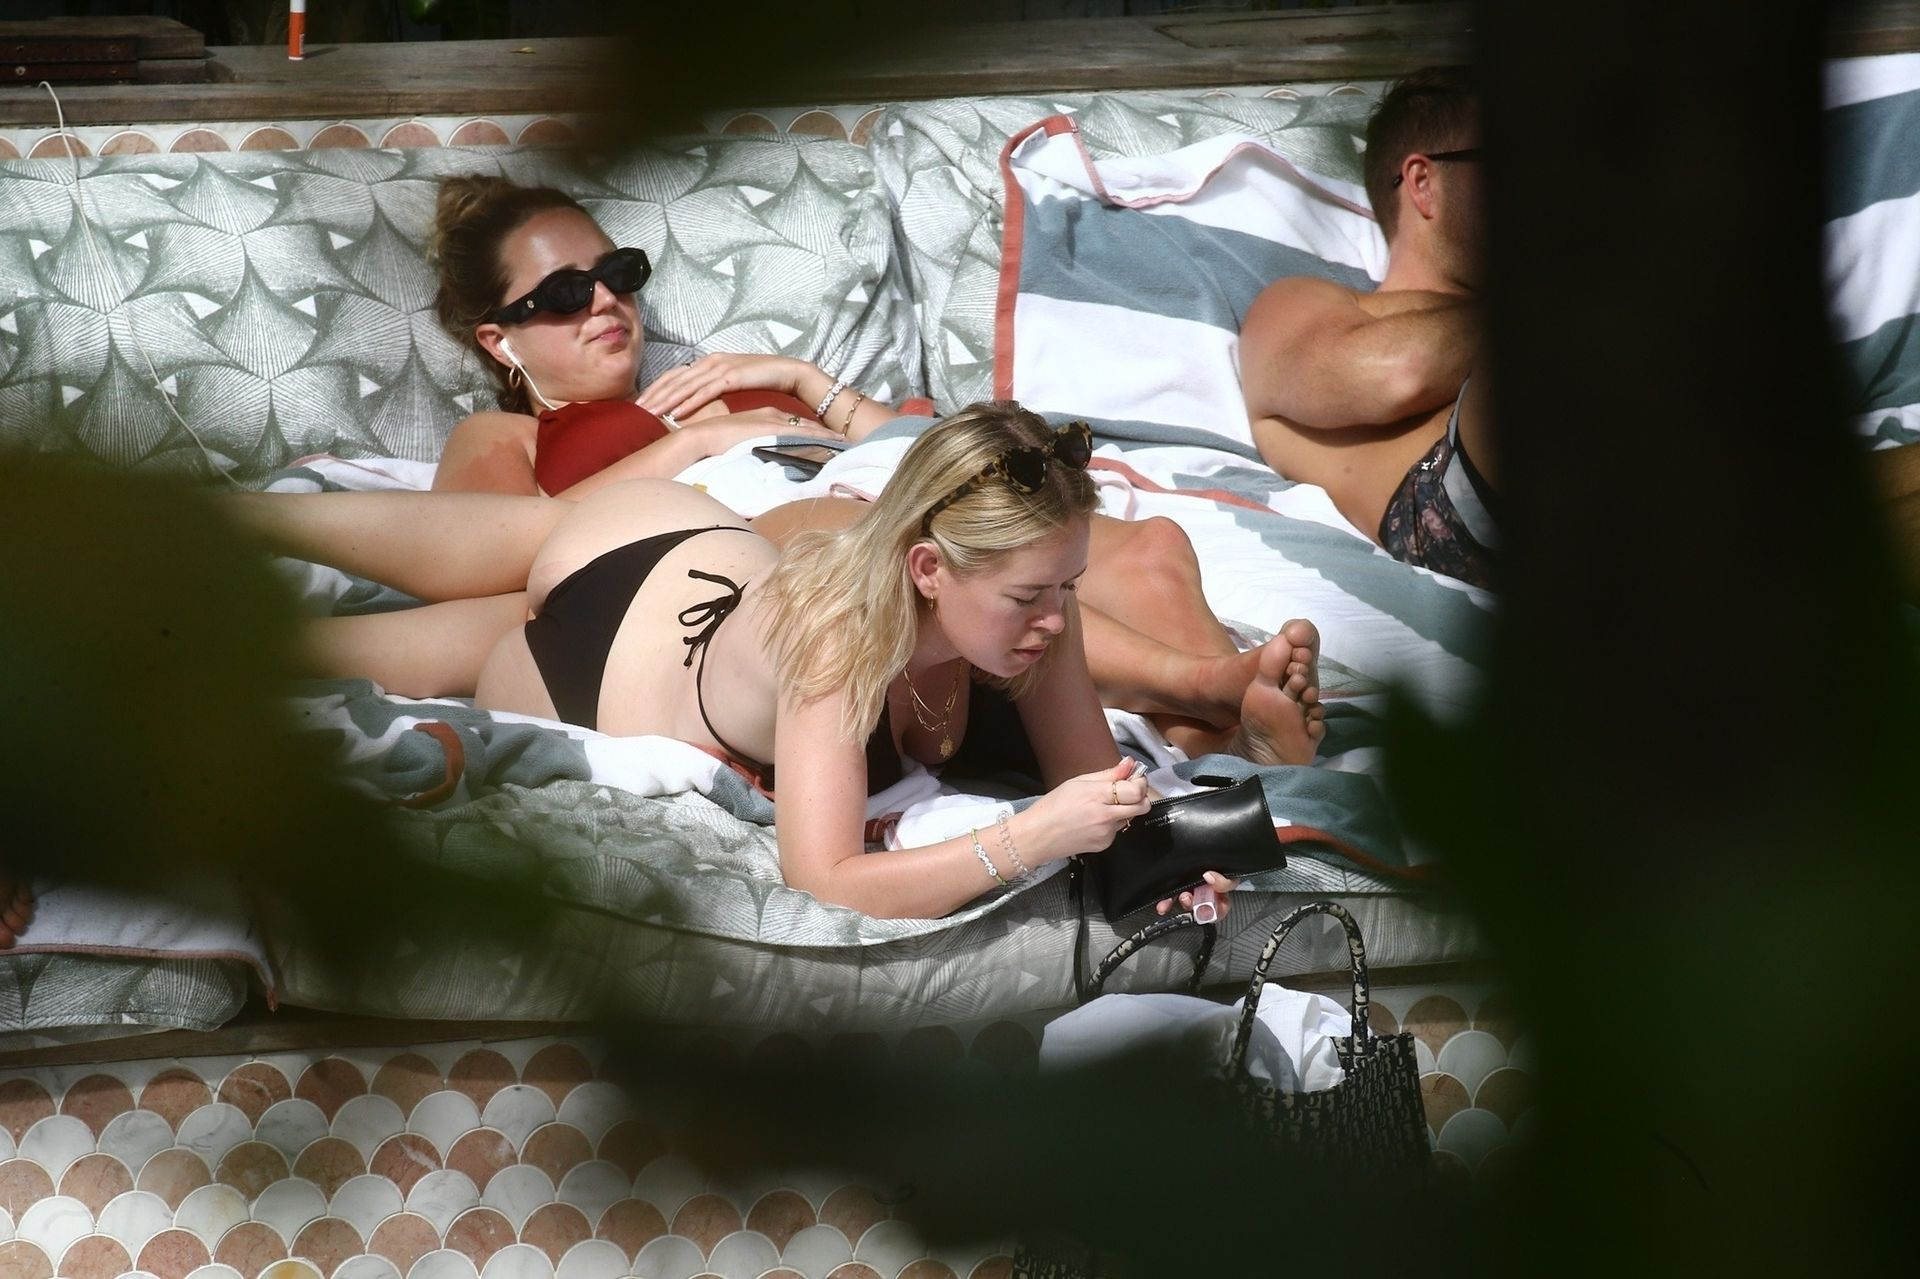 Tanya Burr Shows Off Her Figure In A Bikini 0020